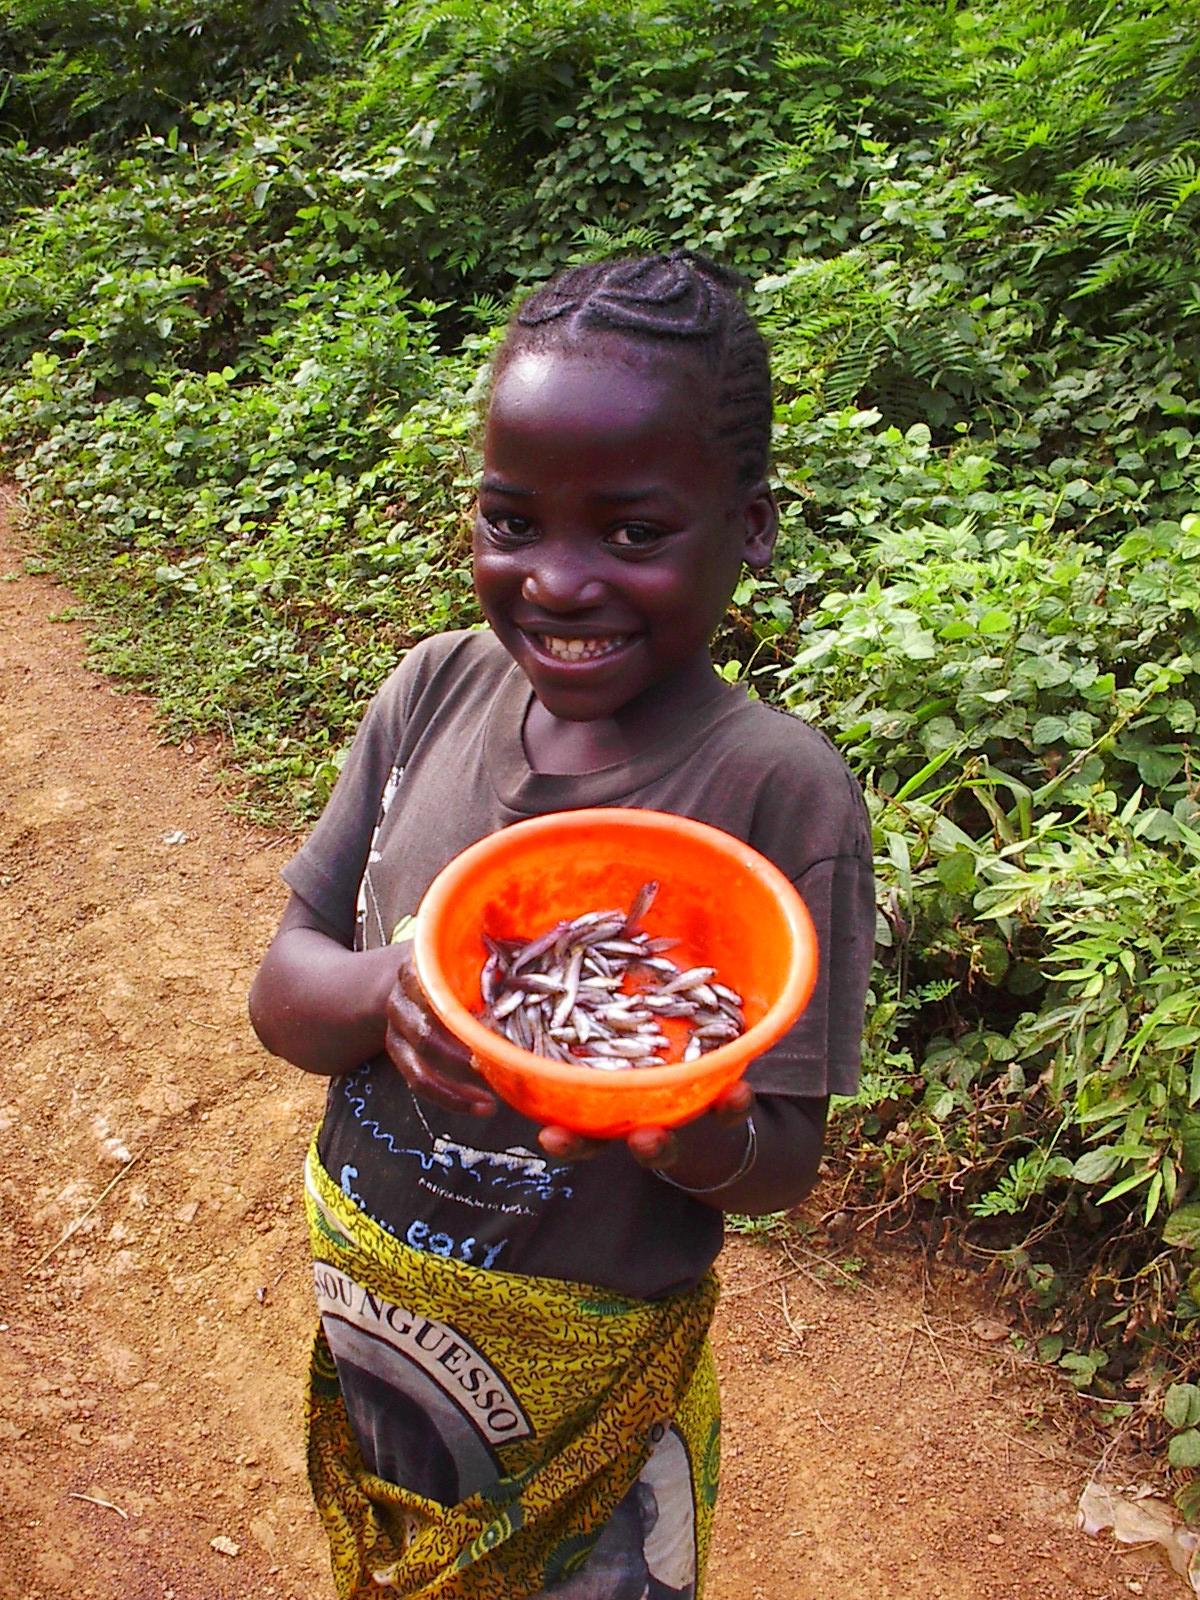 http://jambo.africa.kyoto-u.ac.jp/cgi-bin/CameroonFS/wiki.cgi?action=ATTACH&page=%BC%CC%BF%BF%B4%DB%28%C6%B0%B2%E8%A4%A2%A4%EA%21%29&file=Beyene%2EJPG